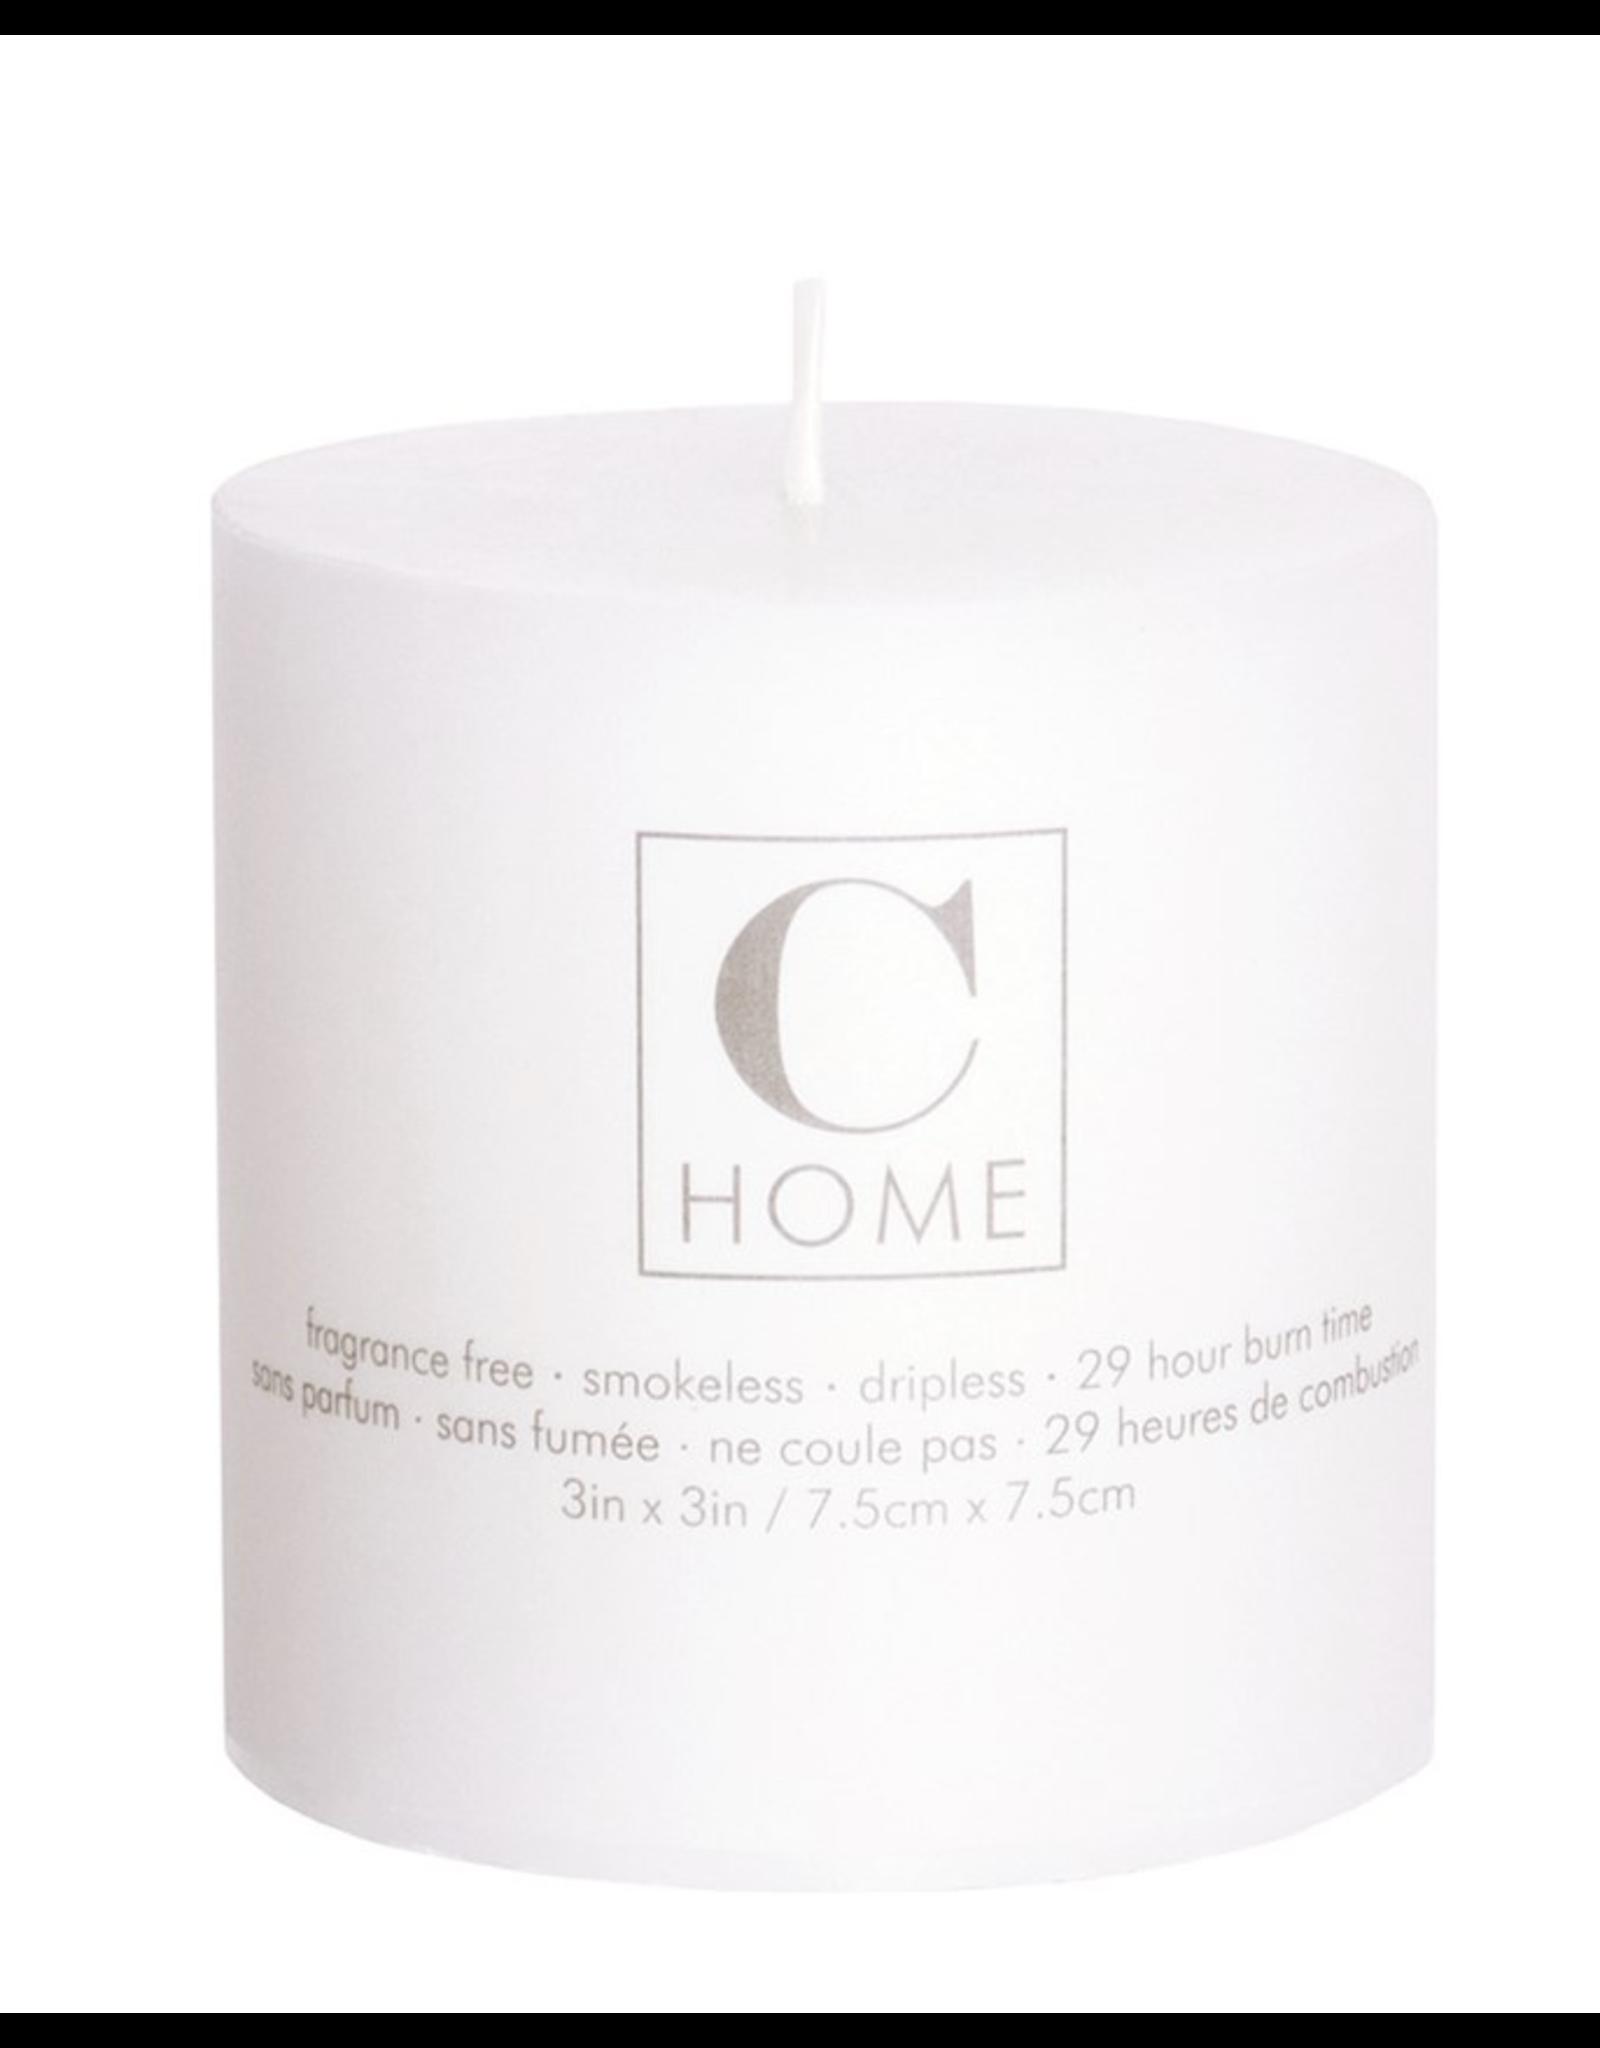 3x3 White Pillar Candle